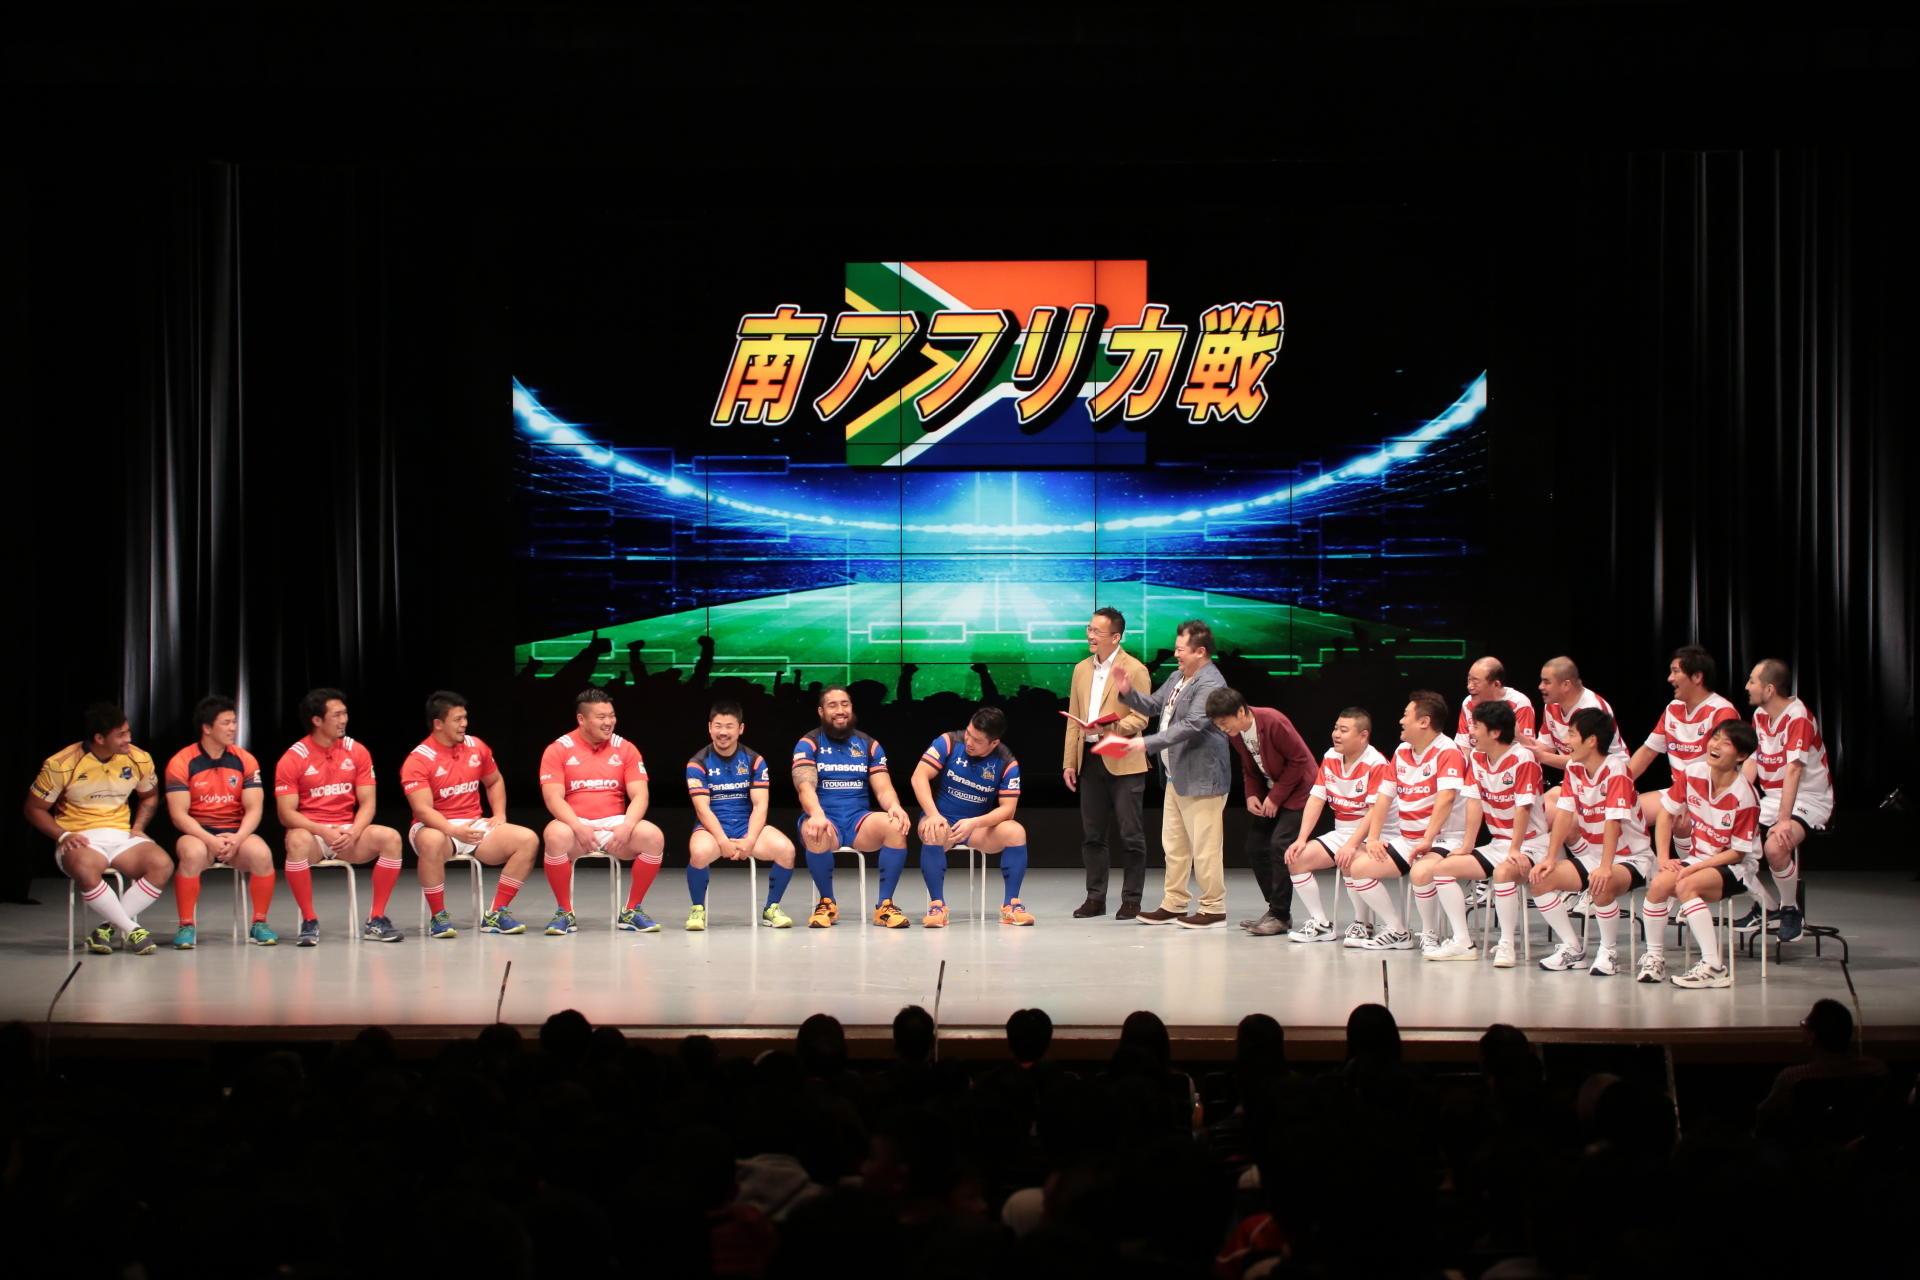 http://news.yoshimoto.co.jp/20160118174542-39bd13fe8c295ebe6fd15c7deda256909f20659e.jpg